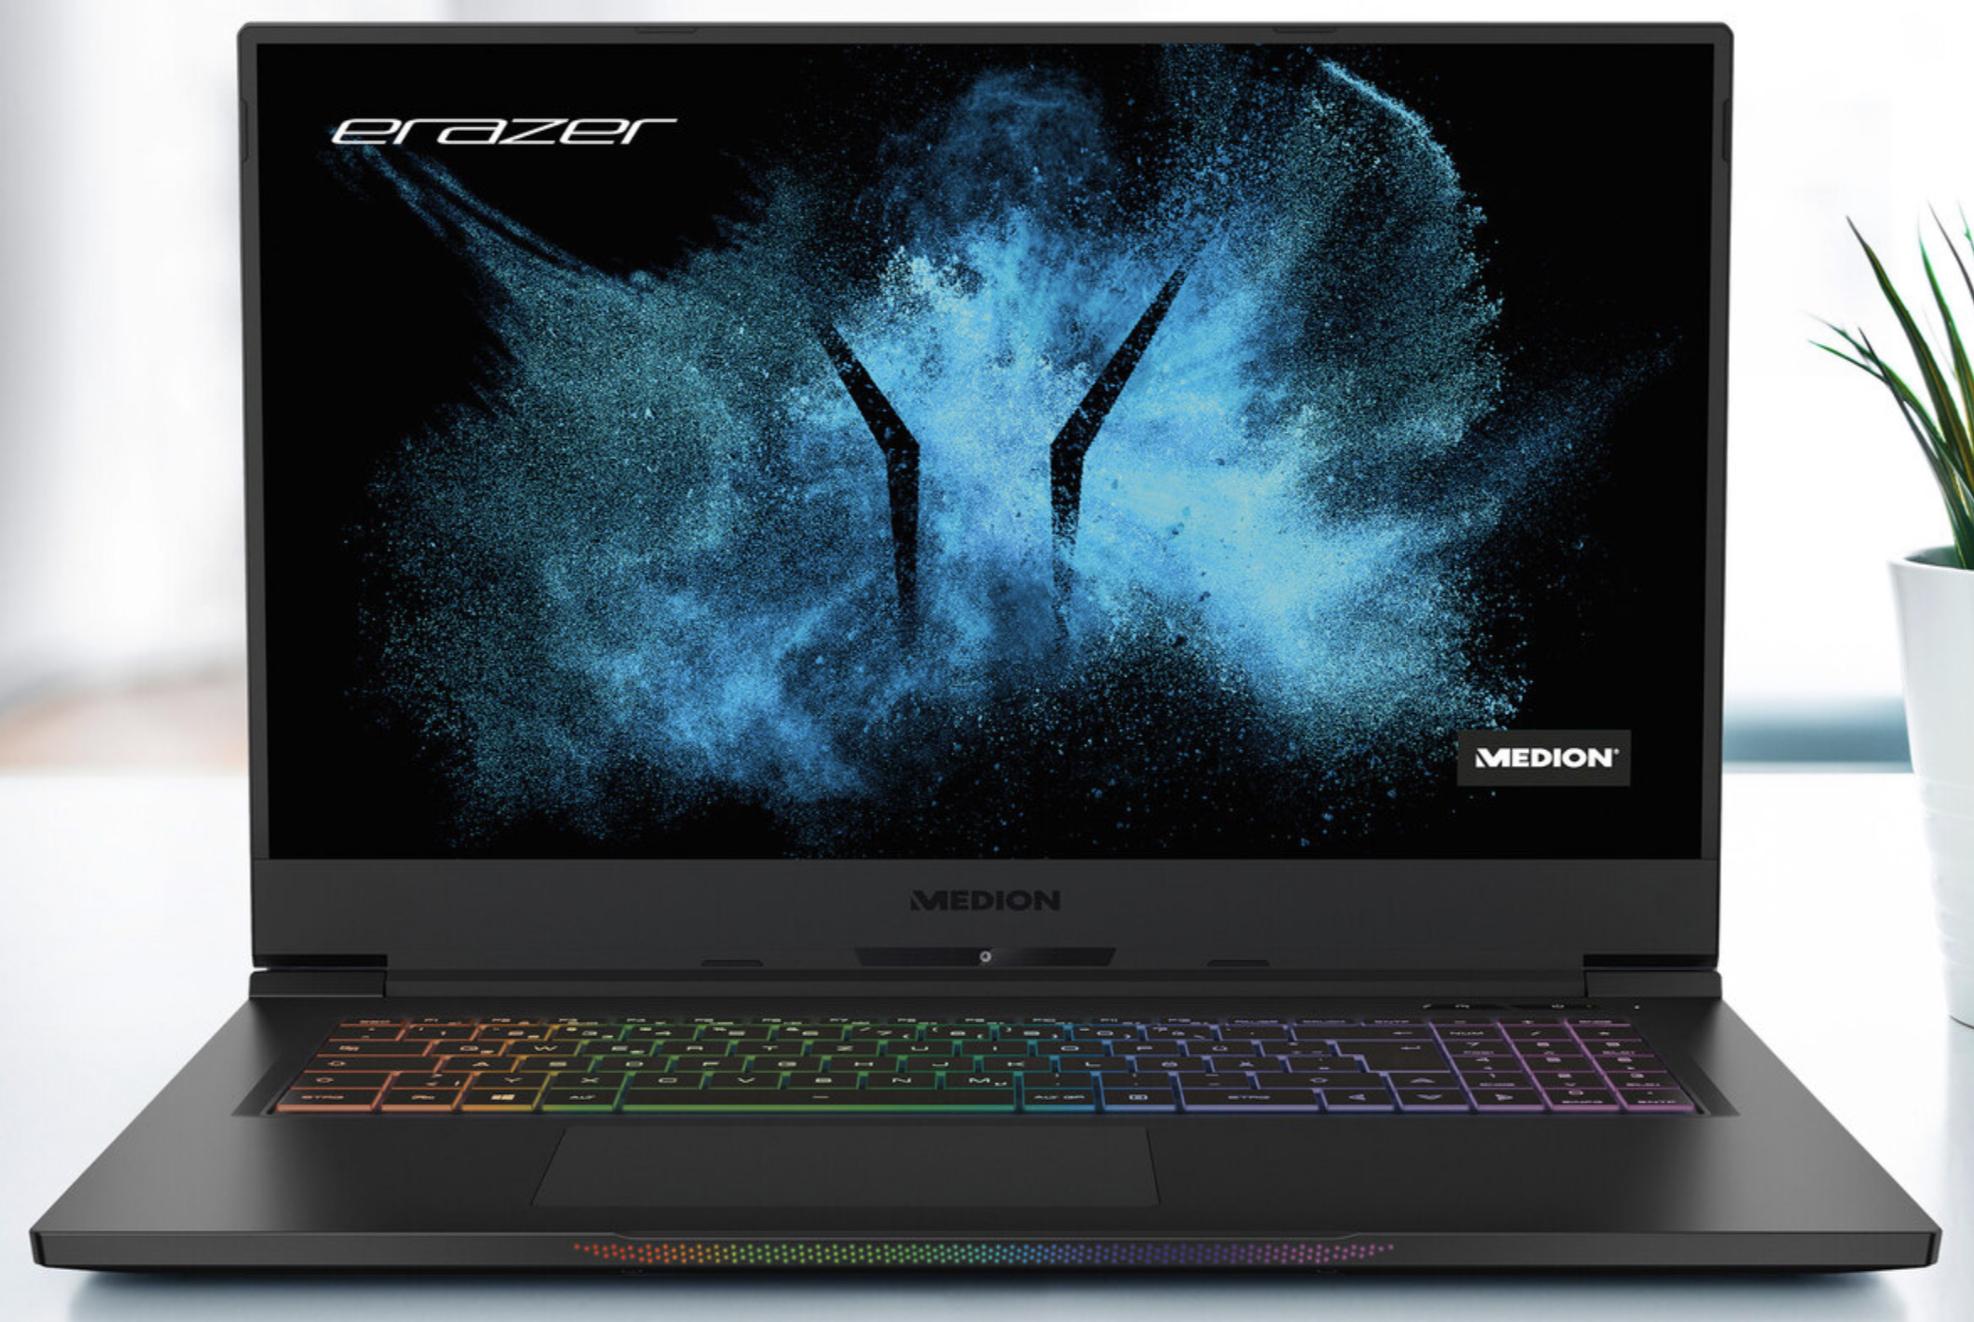 "MEDION ERAZER Beast X10 Gaming Notebook 17,3"" , Intel Core i7-10750H, GeForce RTX 2070 SUPER, 32 GB DDR4 RAM 3.200 MHz, 1TB SSD für 1842,03€"